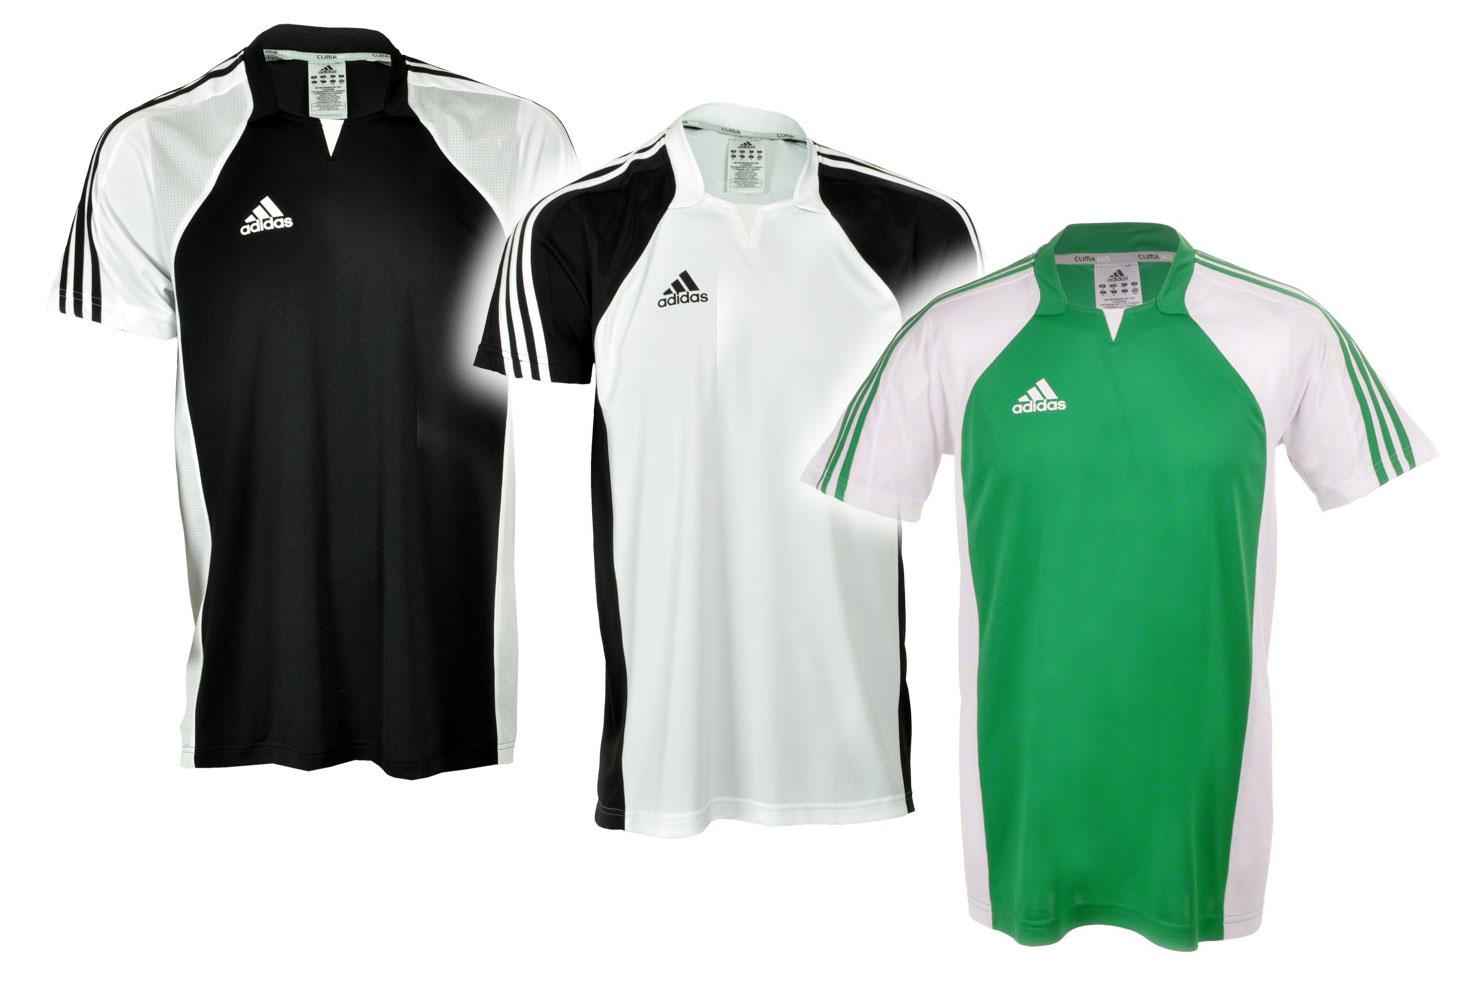 adidas team trikot t shirt gr n wei schwarz xs s m l xl. Black Bedroom Furniture Sets. Home Design Ideas